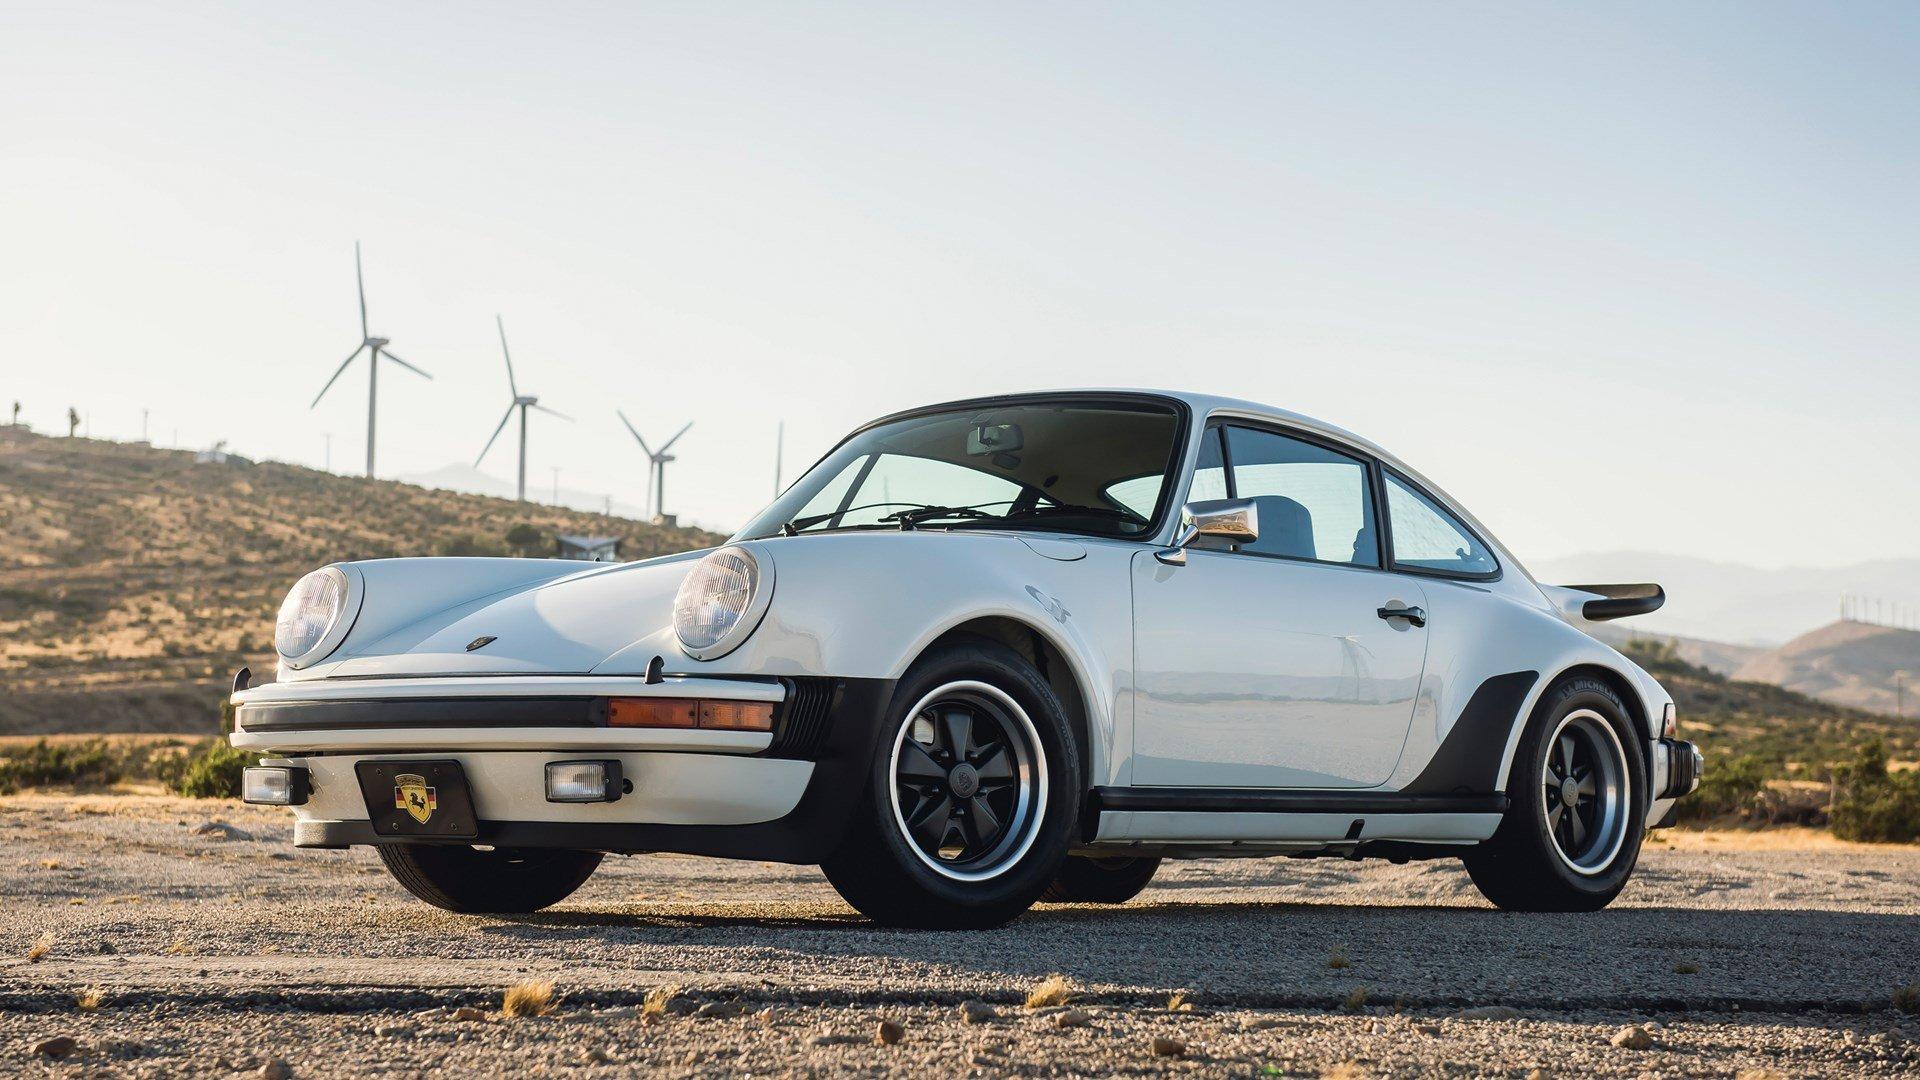 1975 Porsche 911 Turbo 911 Turbo Carrera Vintage Car For Sale